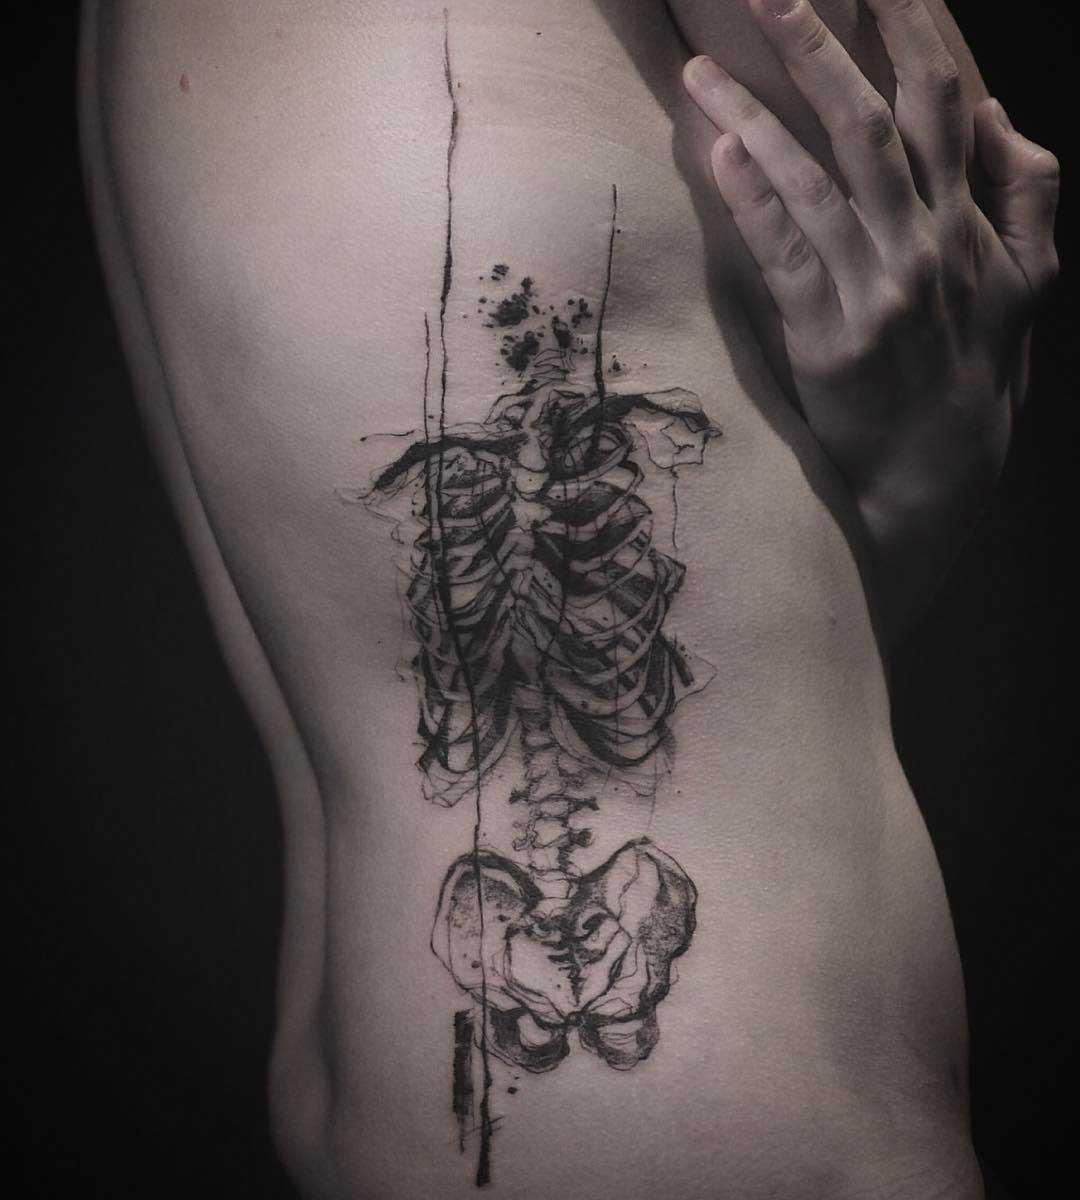 pencil drawn skeleton tattoo on ribs